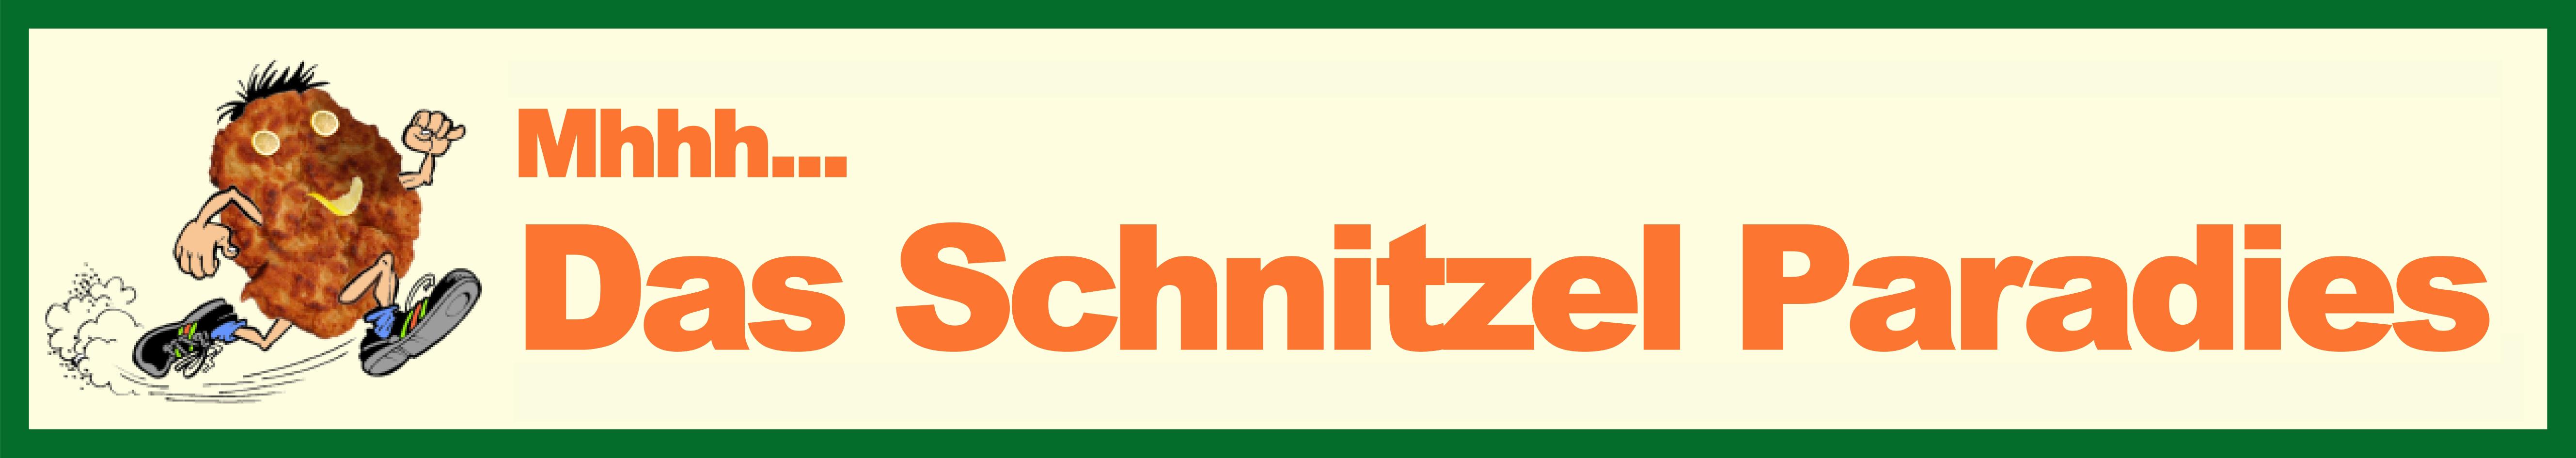 Schnitzelparadies Nürnberg